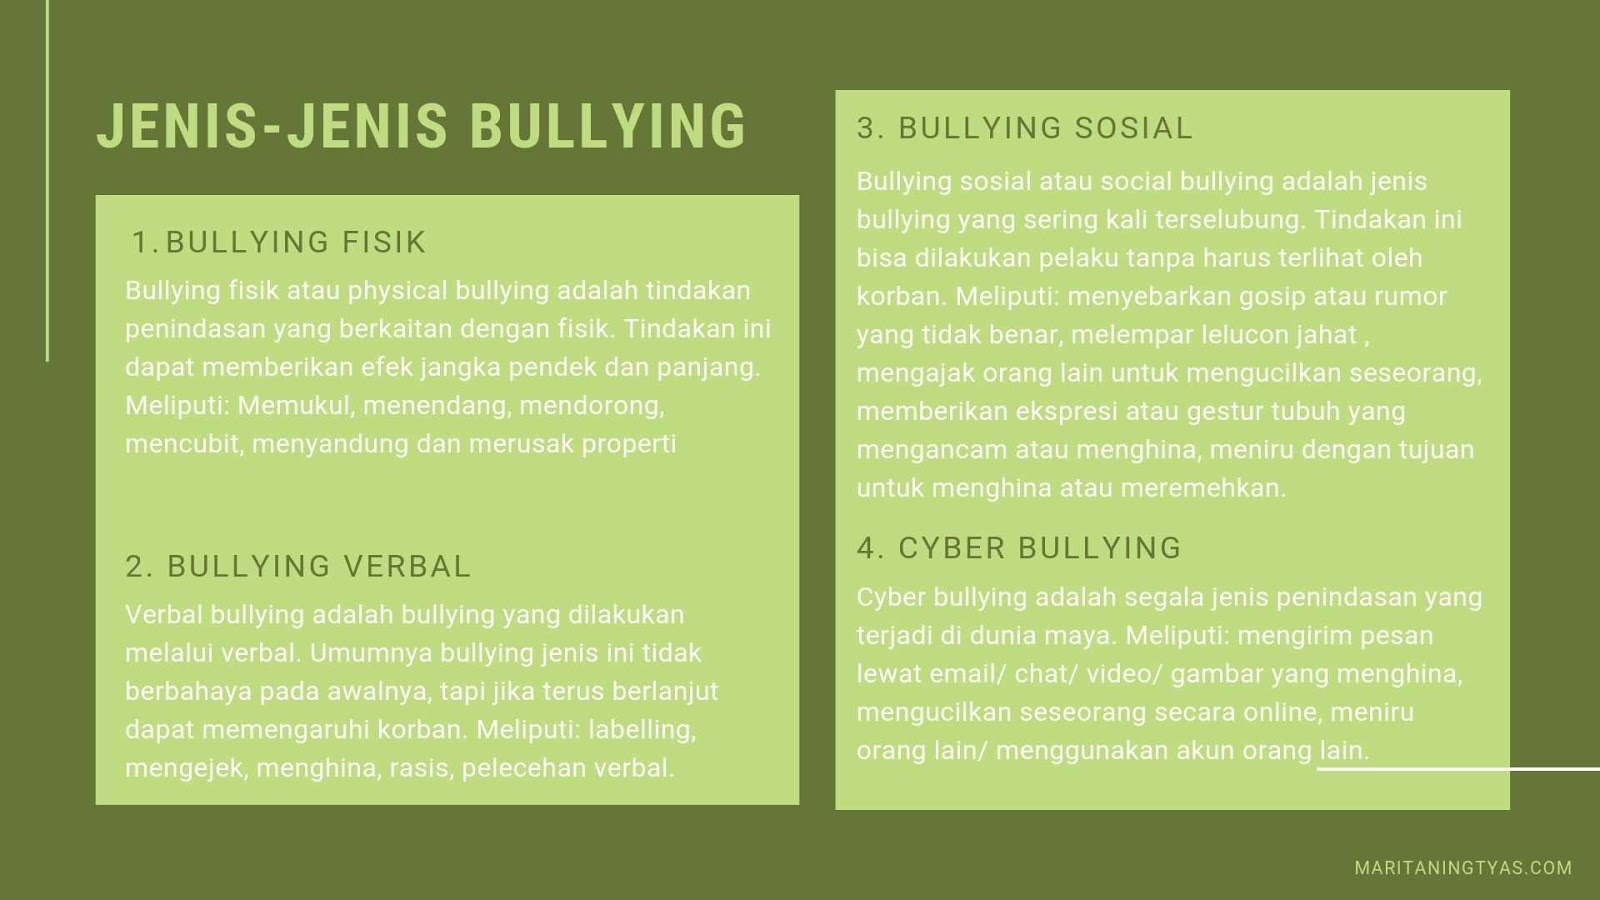 jenis-jenis bullying pada keluarga pasien covid 19 dan tenaga medis